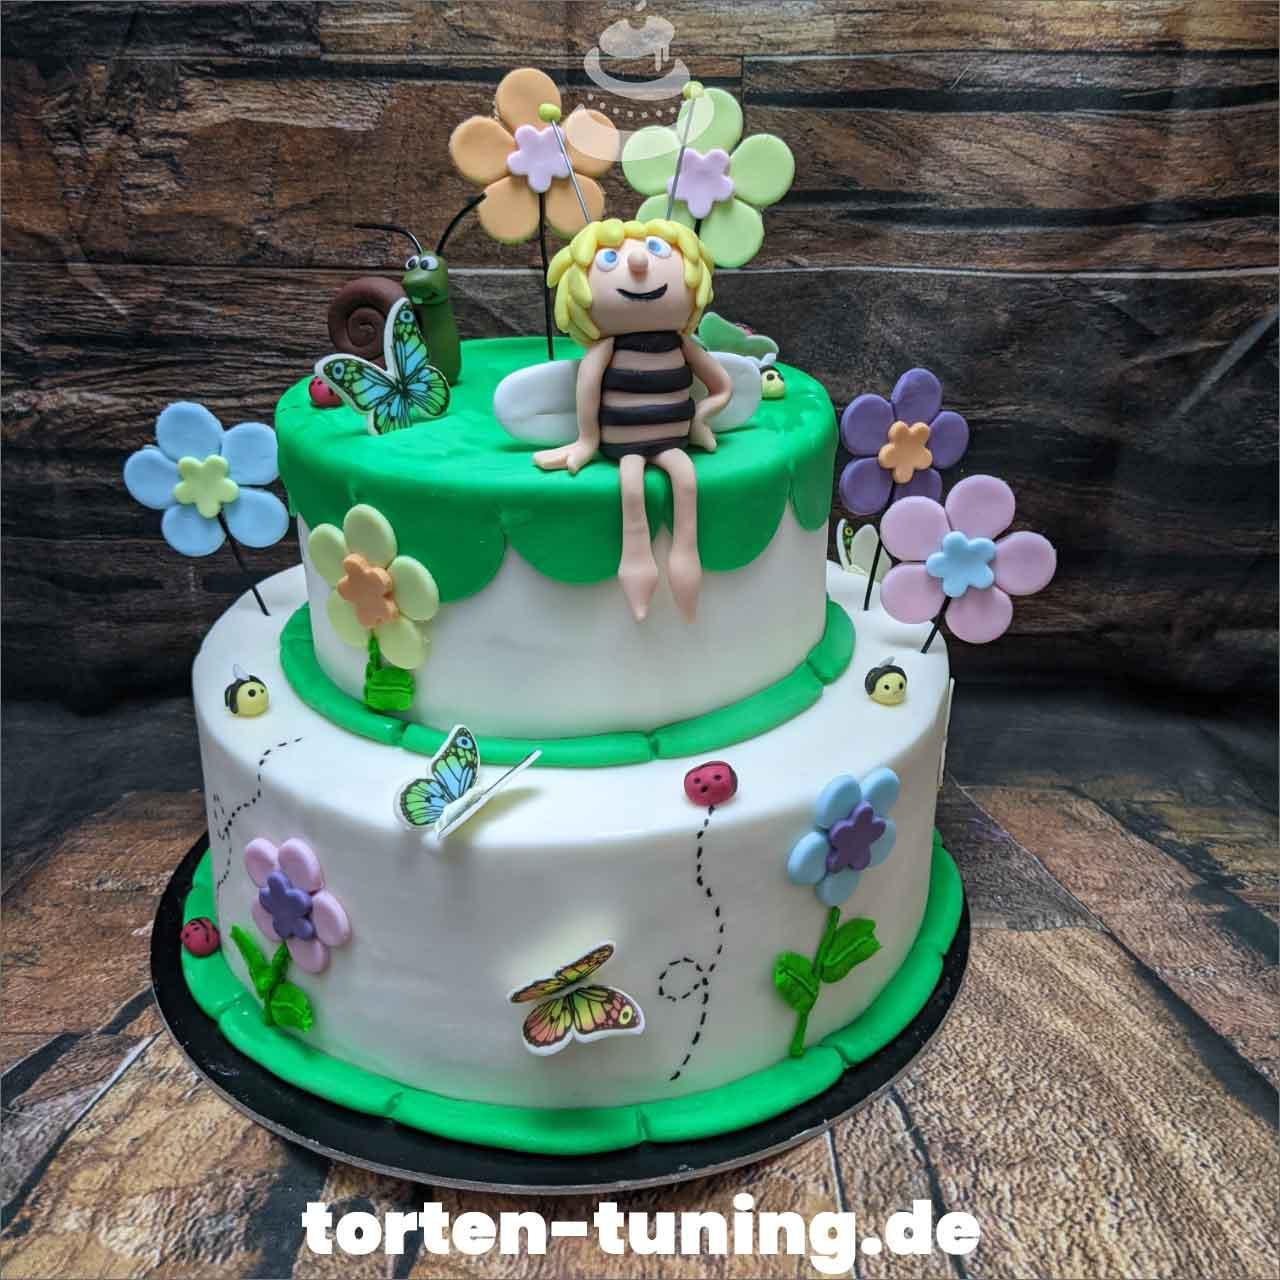 Biene Maja Dripcake Obsttorte Geburtstagstorte Motivtorte Torte Tortendekoration Torte online bestellen Suhl Thüringen Torten Tuning Sahnetorte Tortenfiguren Cake Topper